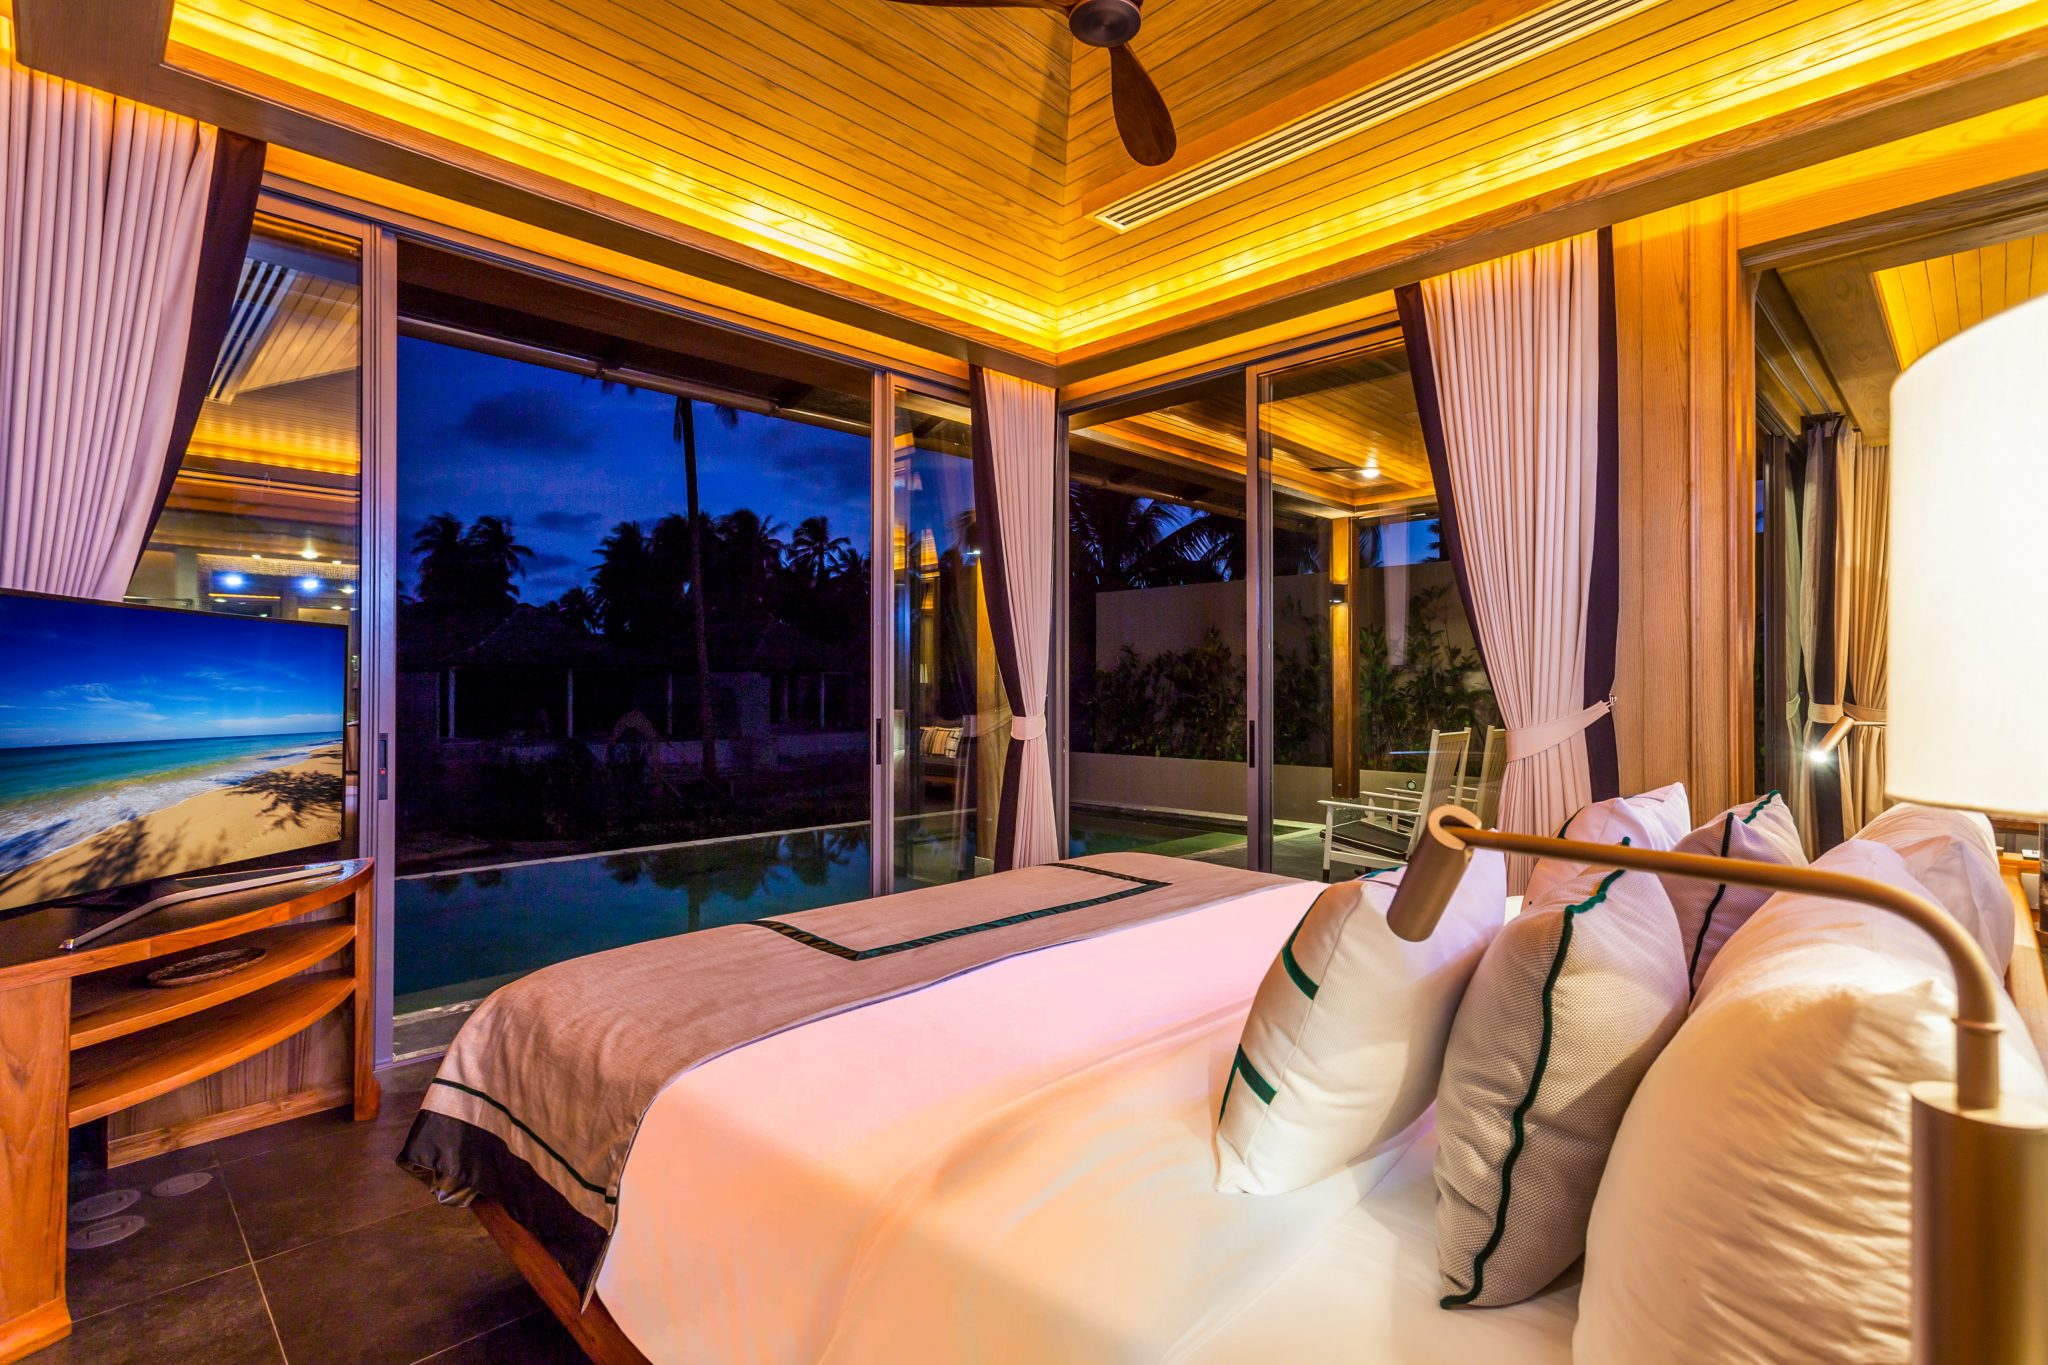 Phuket Real Estate Agency – Natai Beach (3)